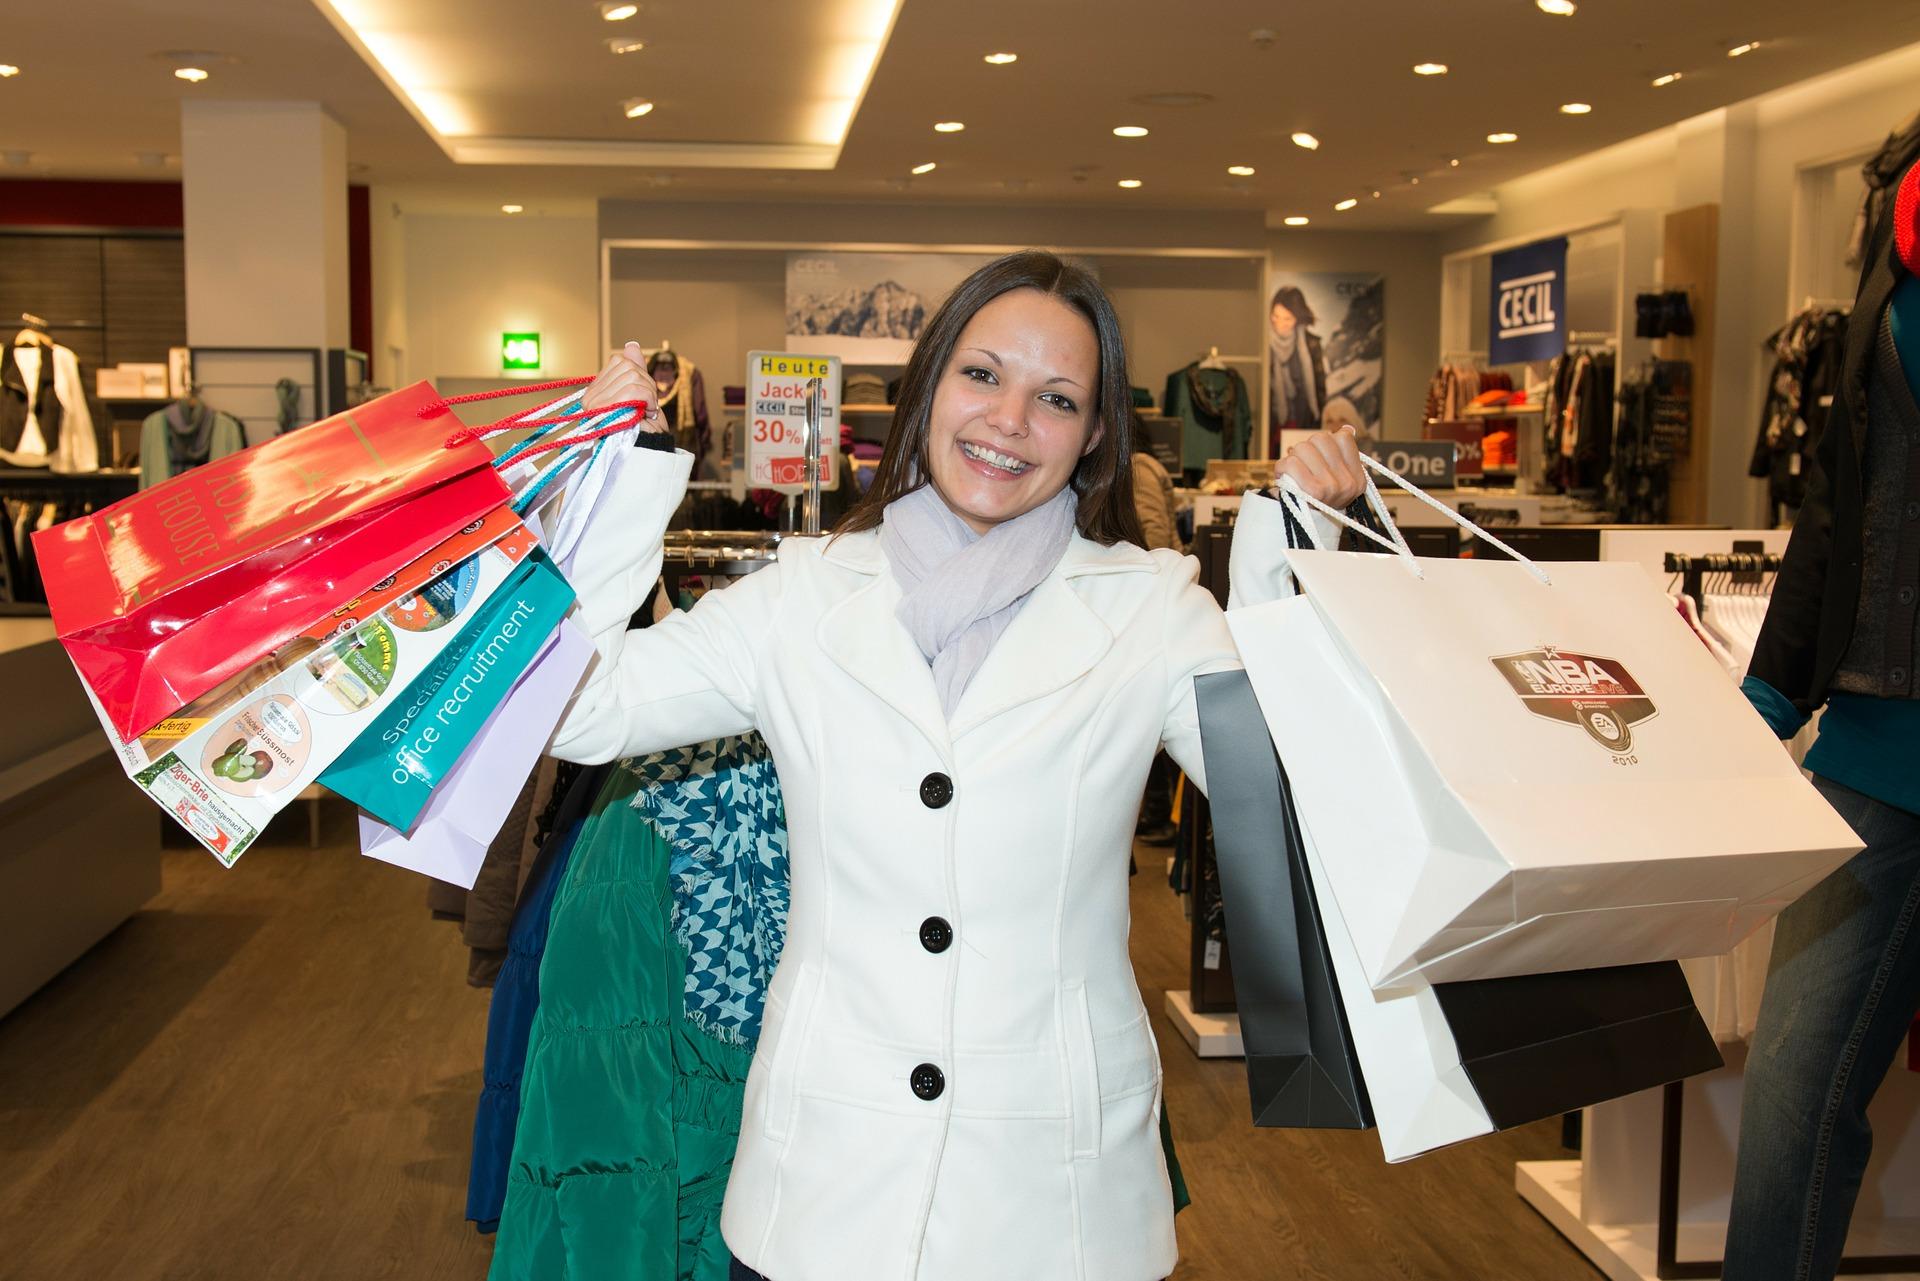 kvinde shopper amok med muleposer